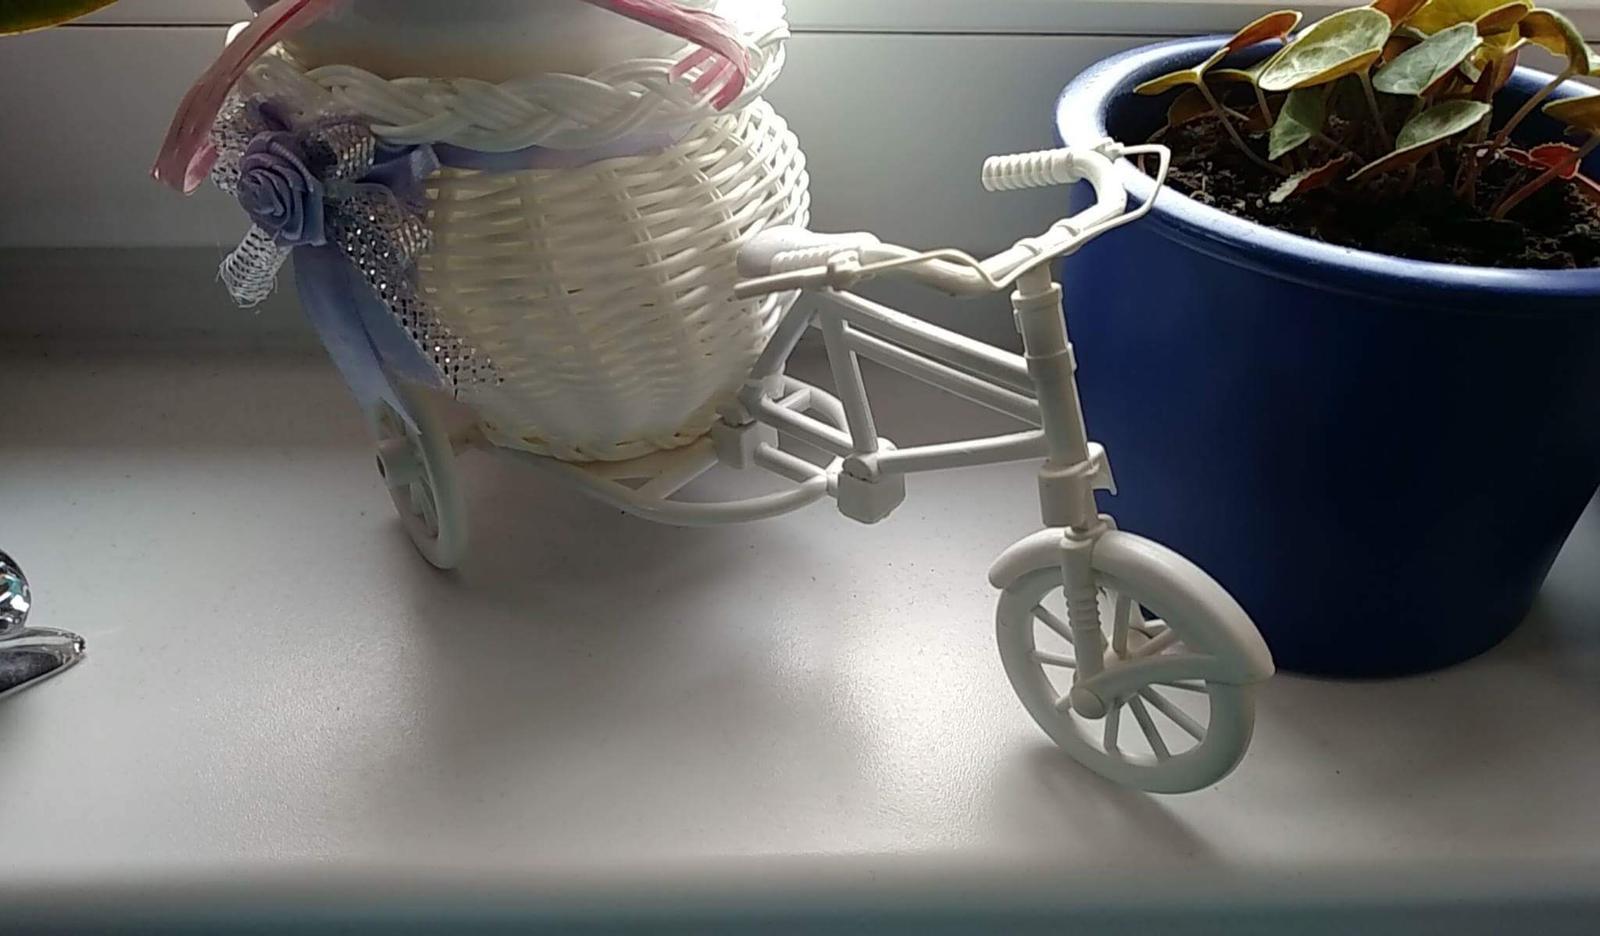 Stojan na kvety, vazu, sviecku, bicykel, trojkolka - Obrázok č. 2